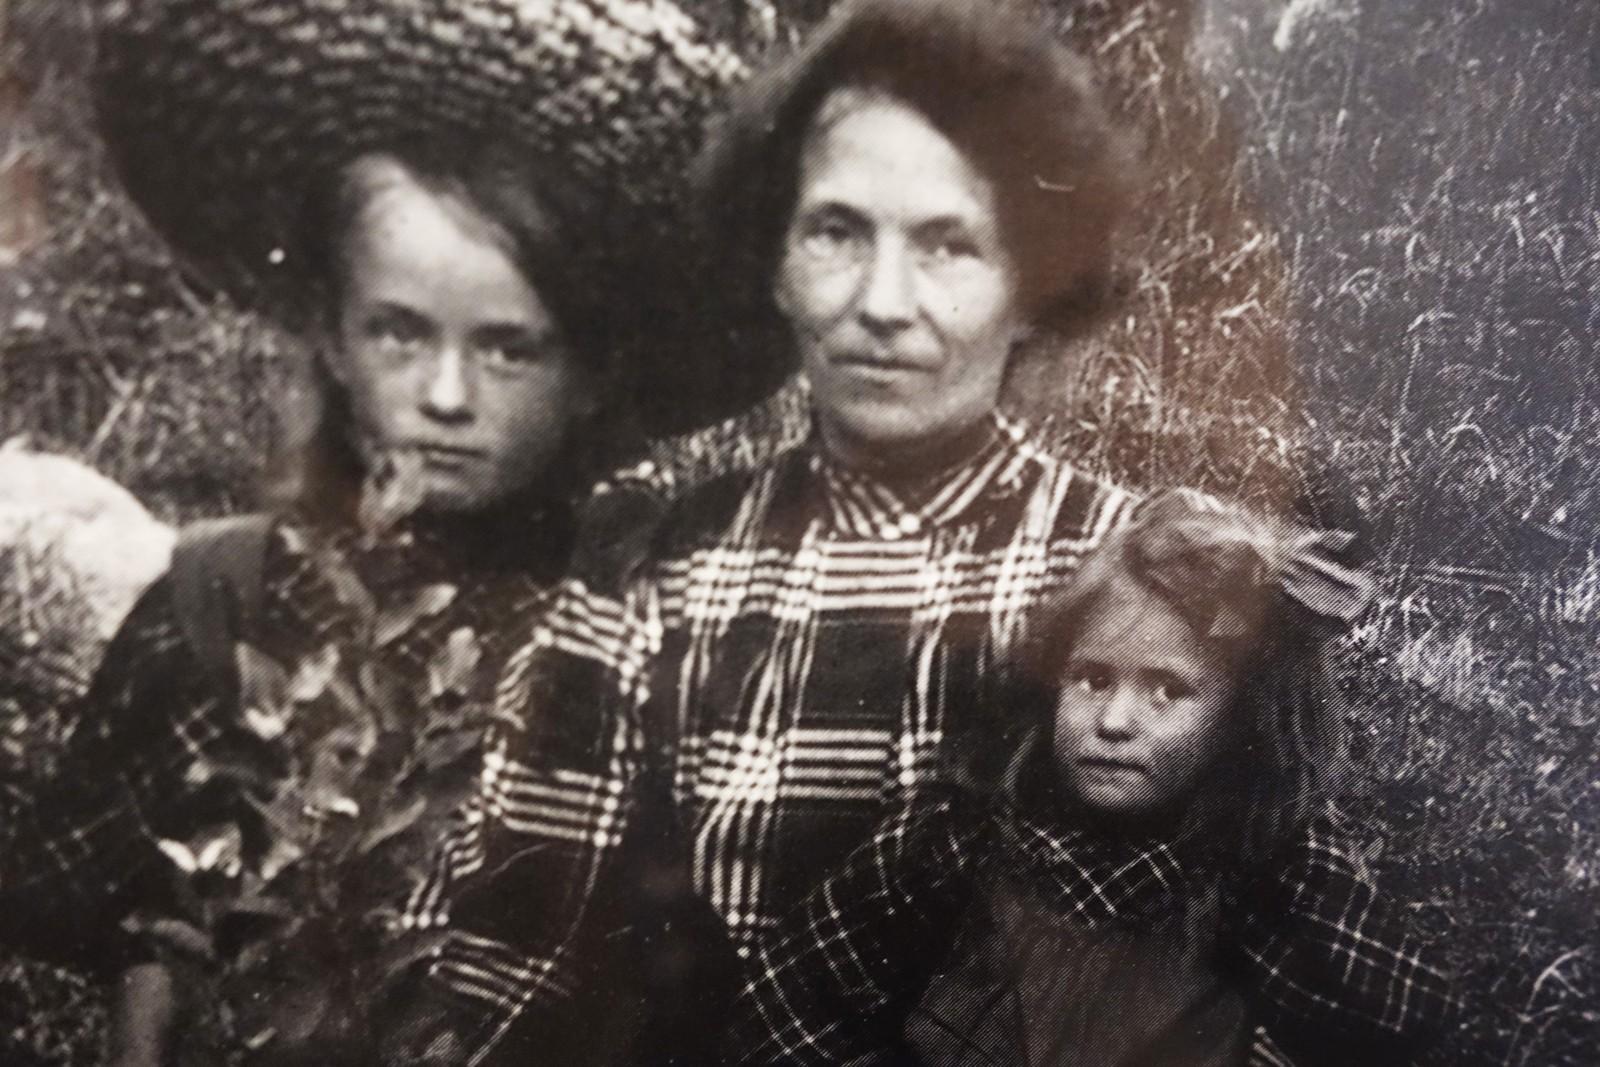 Anna og søster Gunvor med mor på tur i Eikebergvika i 1906.